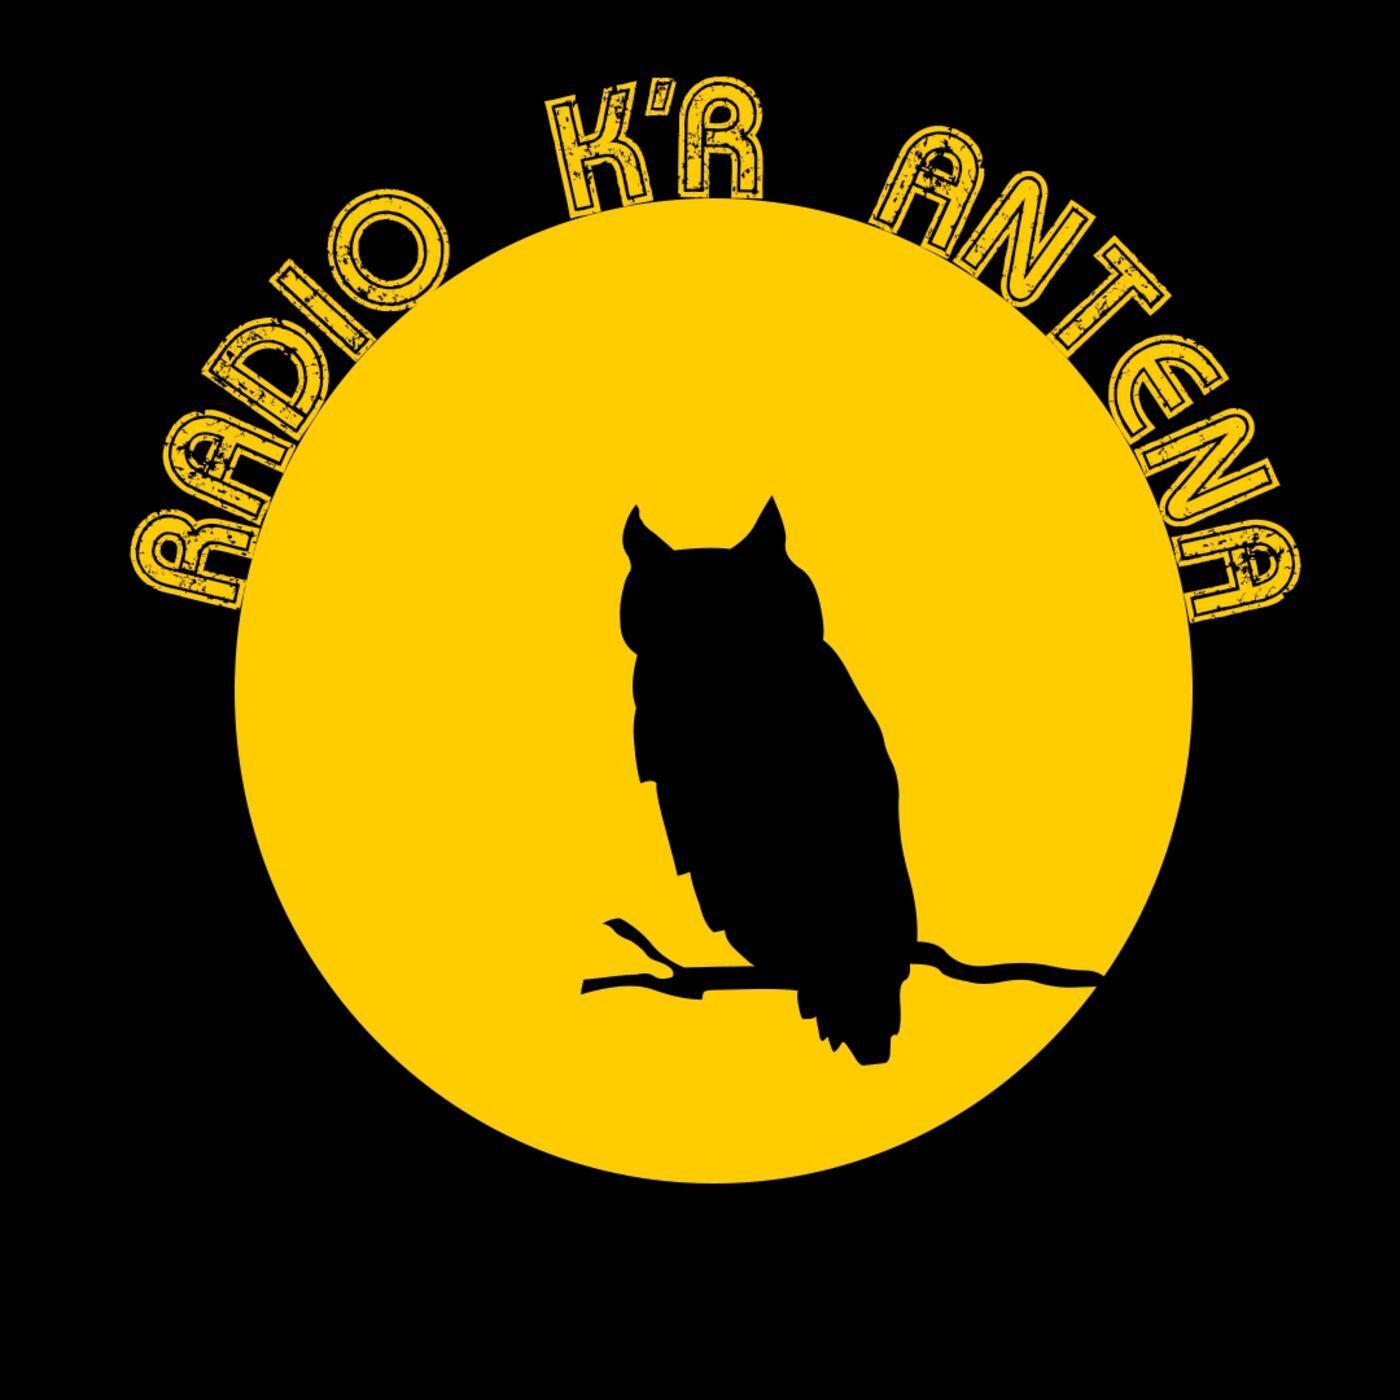 Radio K'r antena - Ornitologija: Čudni tiči